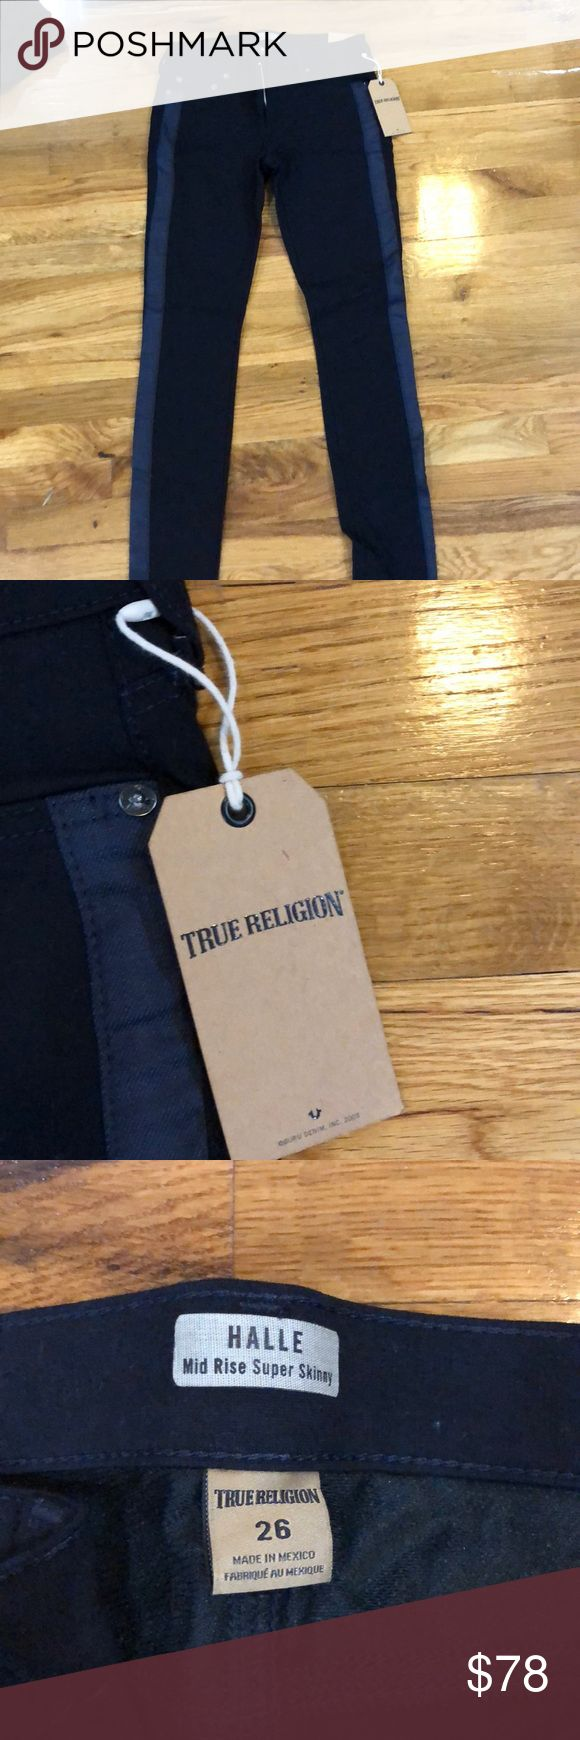 True Religion jeans Black with a grey stripe. True Religion jeans True Religion Jeans Skinny